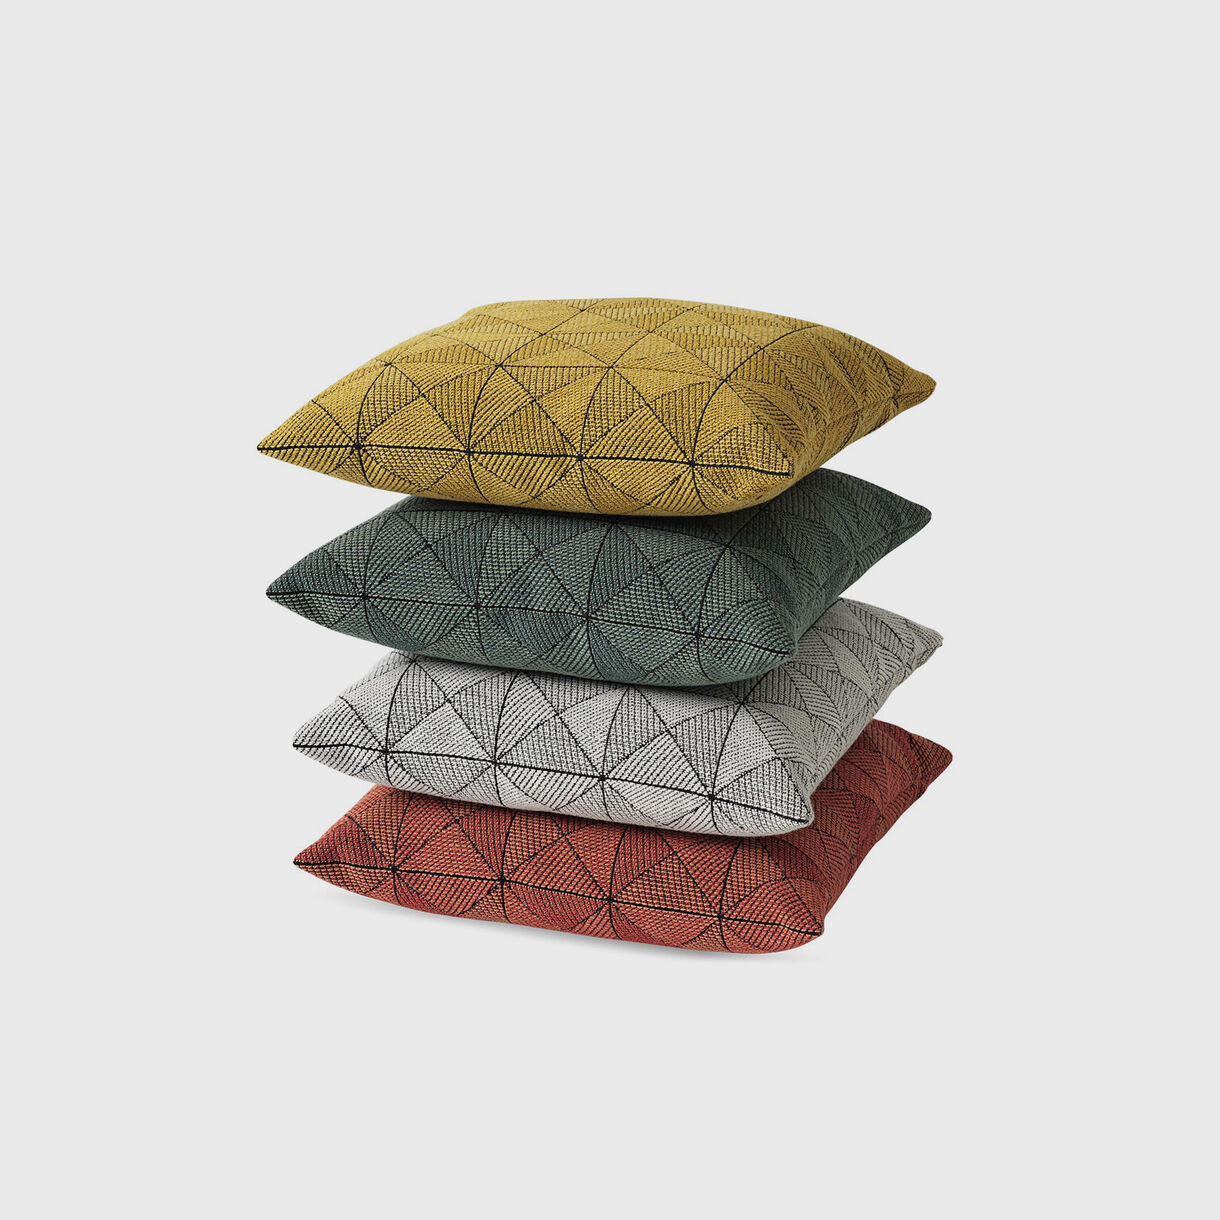 Tile Cushions, Group